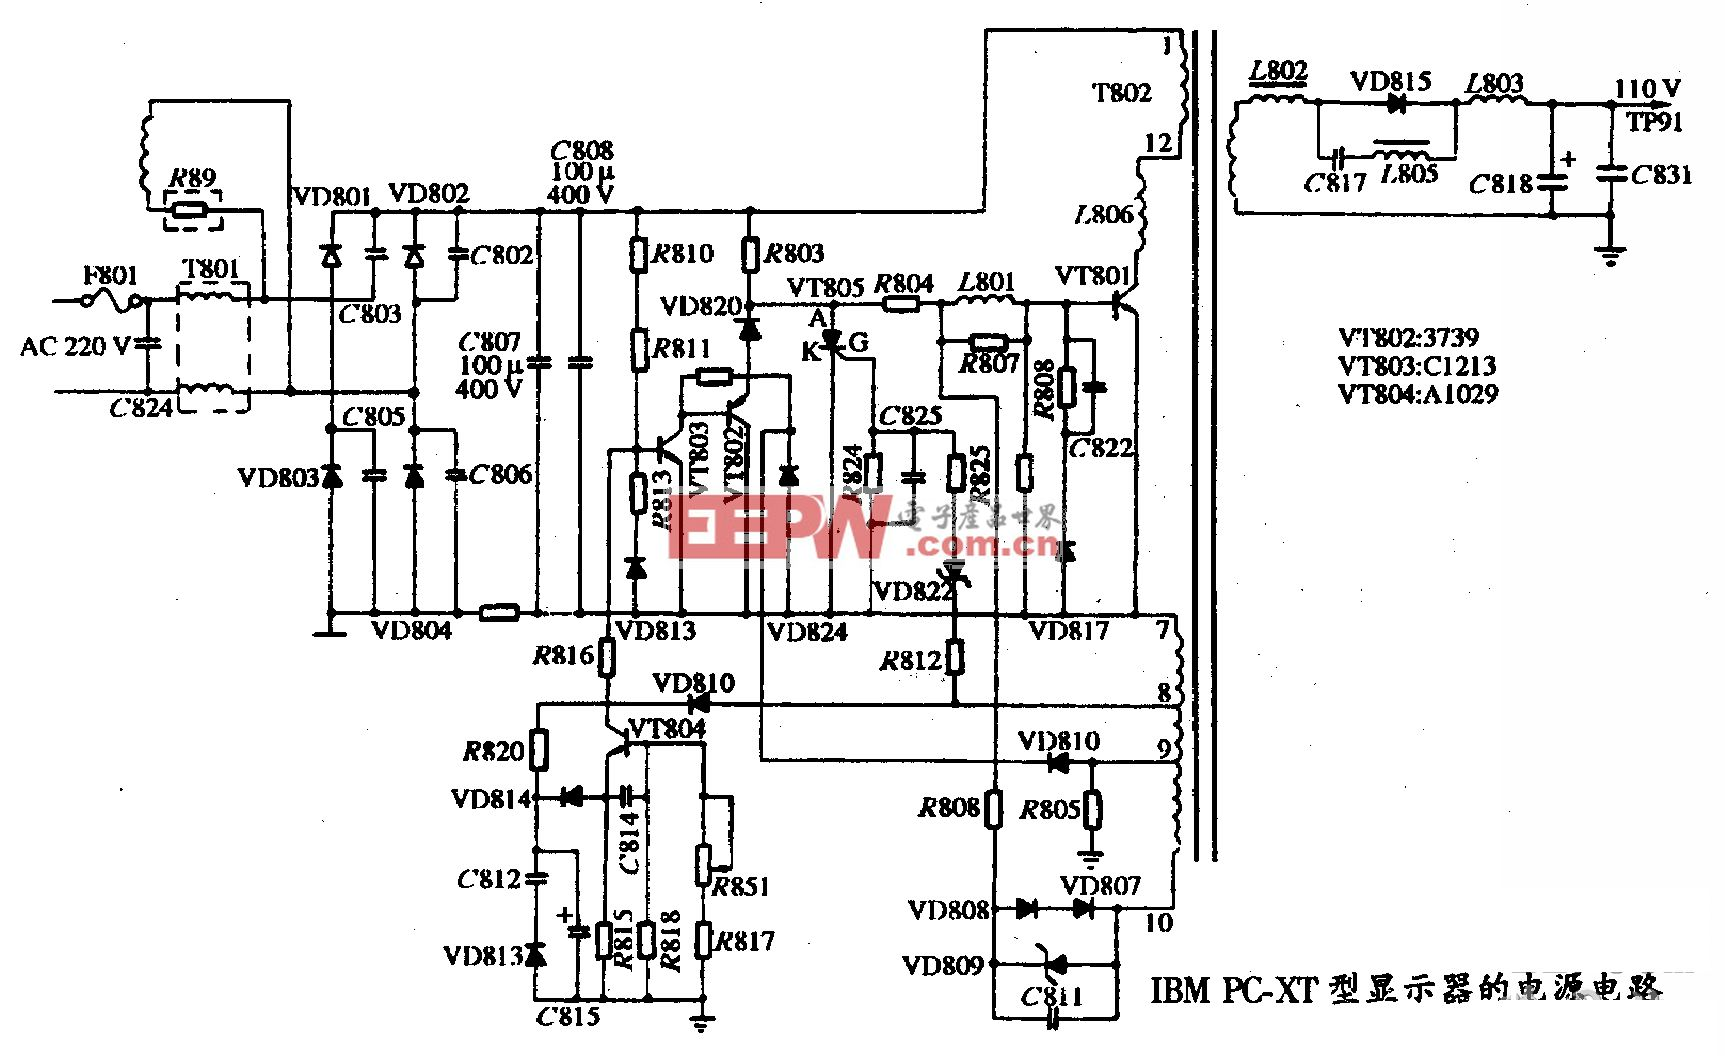 IBM PC-XT型显示器的电源电路图